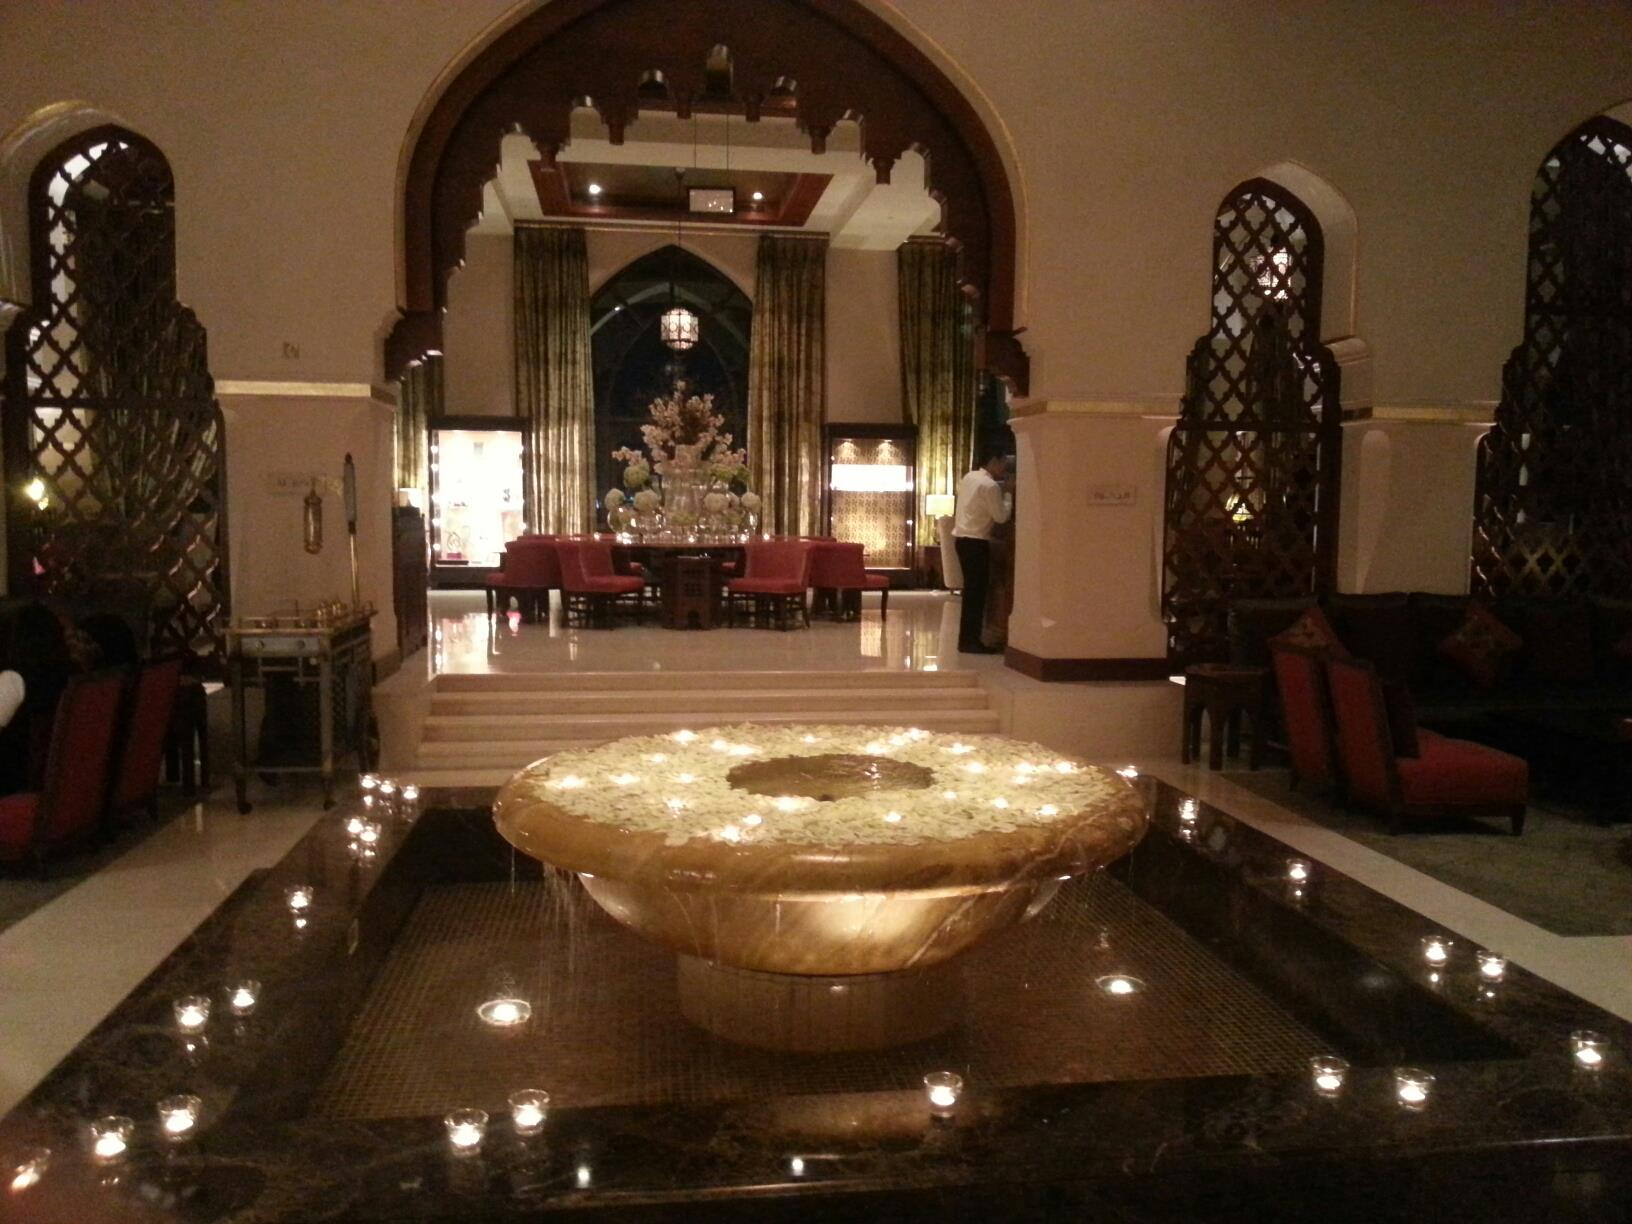 Inside Palace Hotel, Old Town, Dubai.jpg